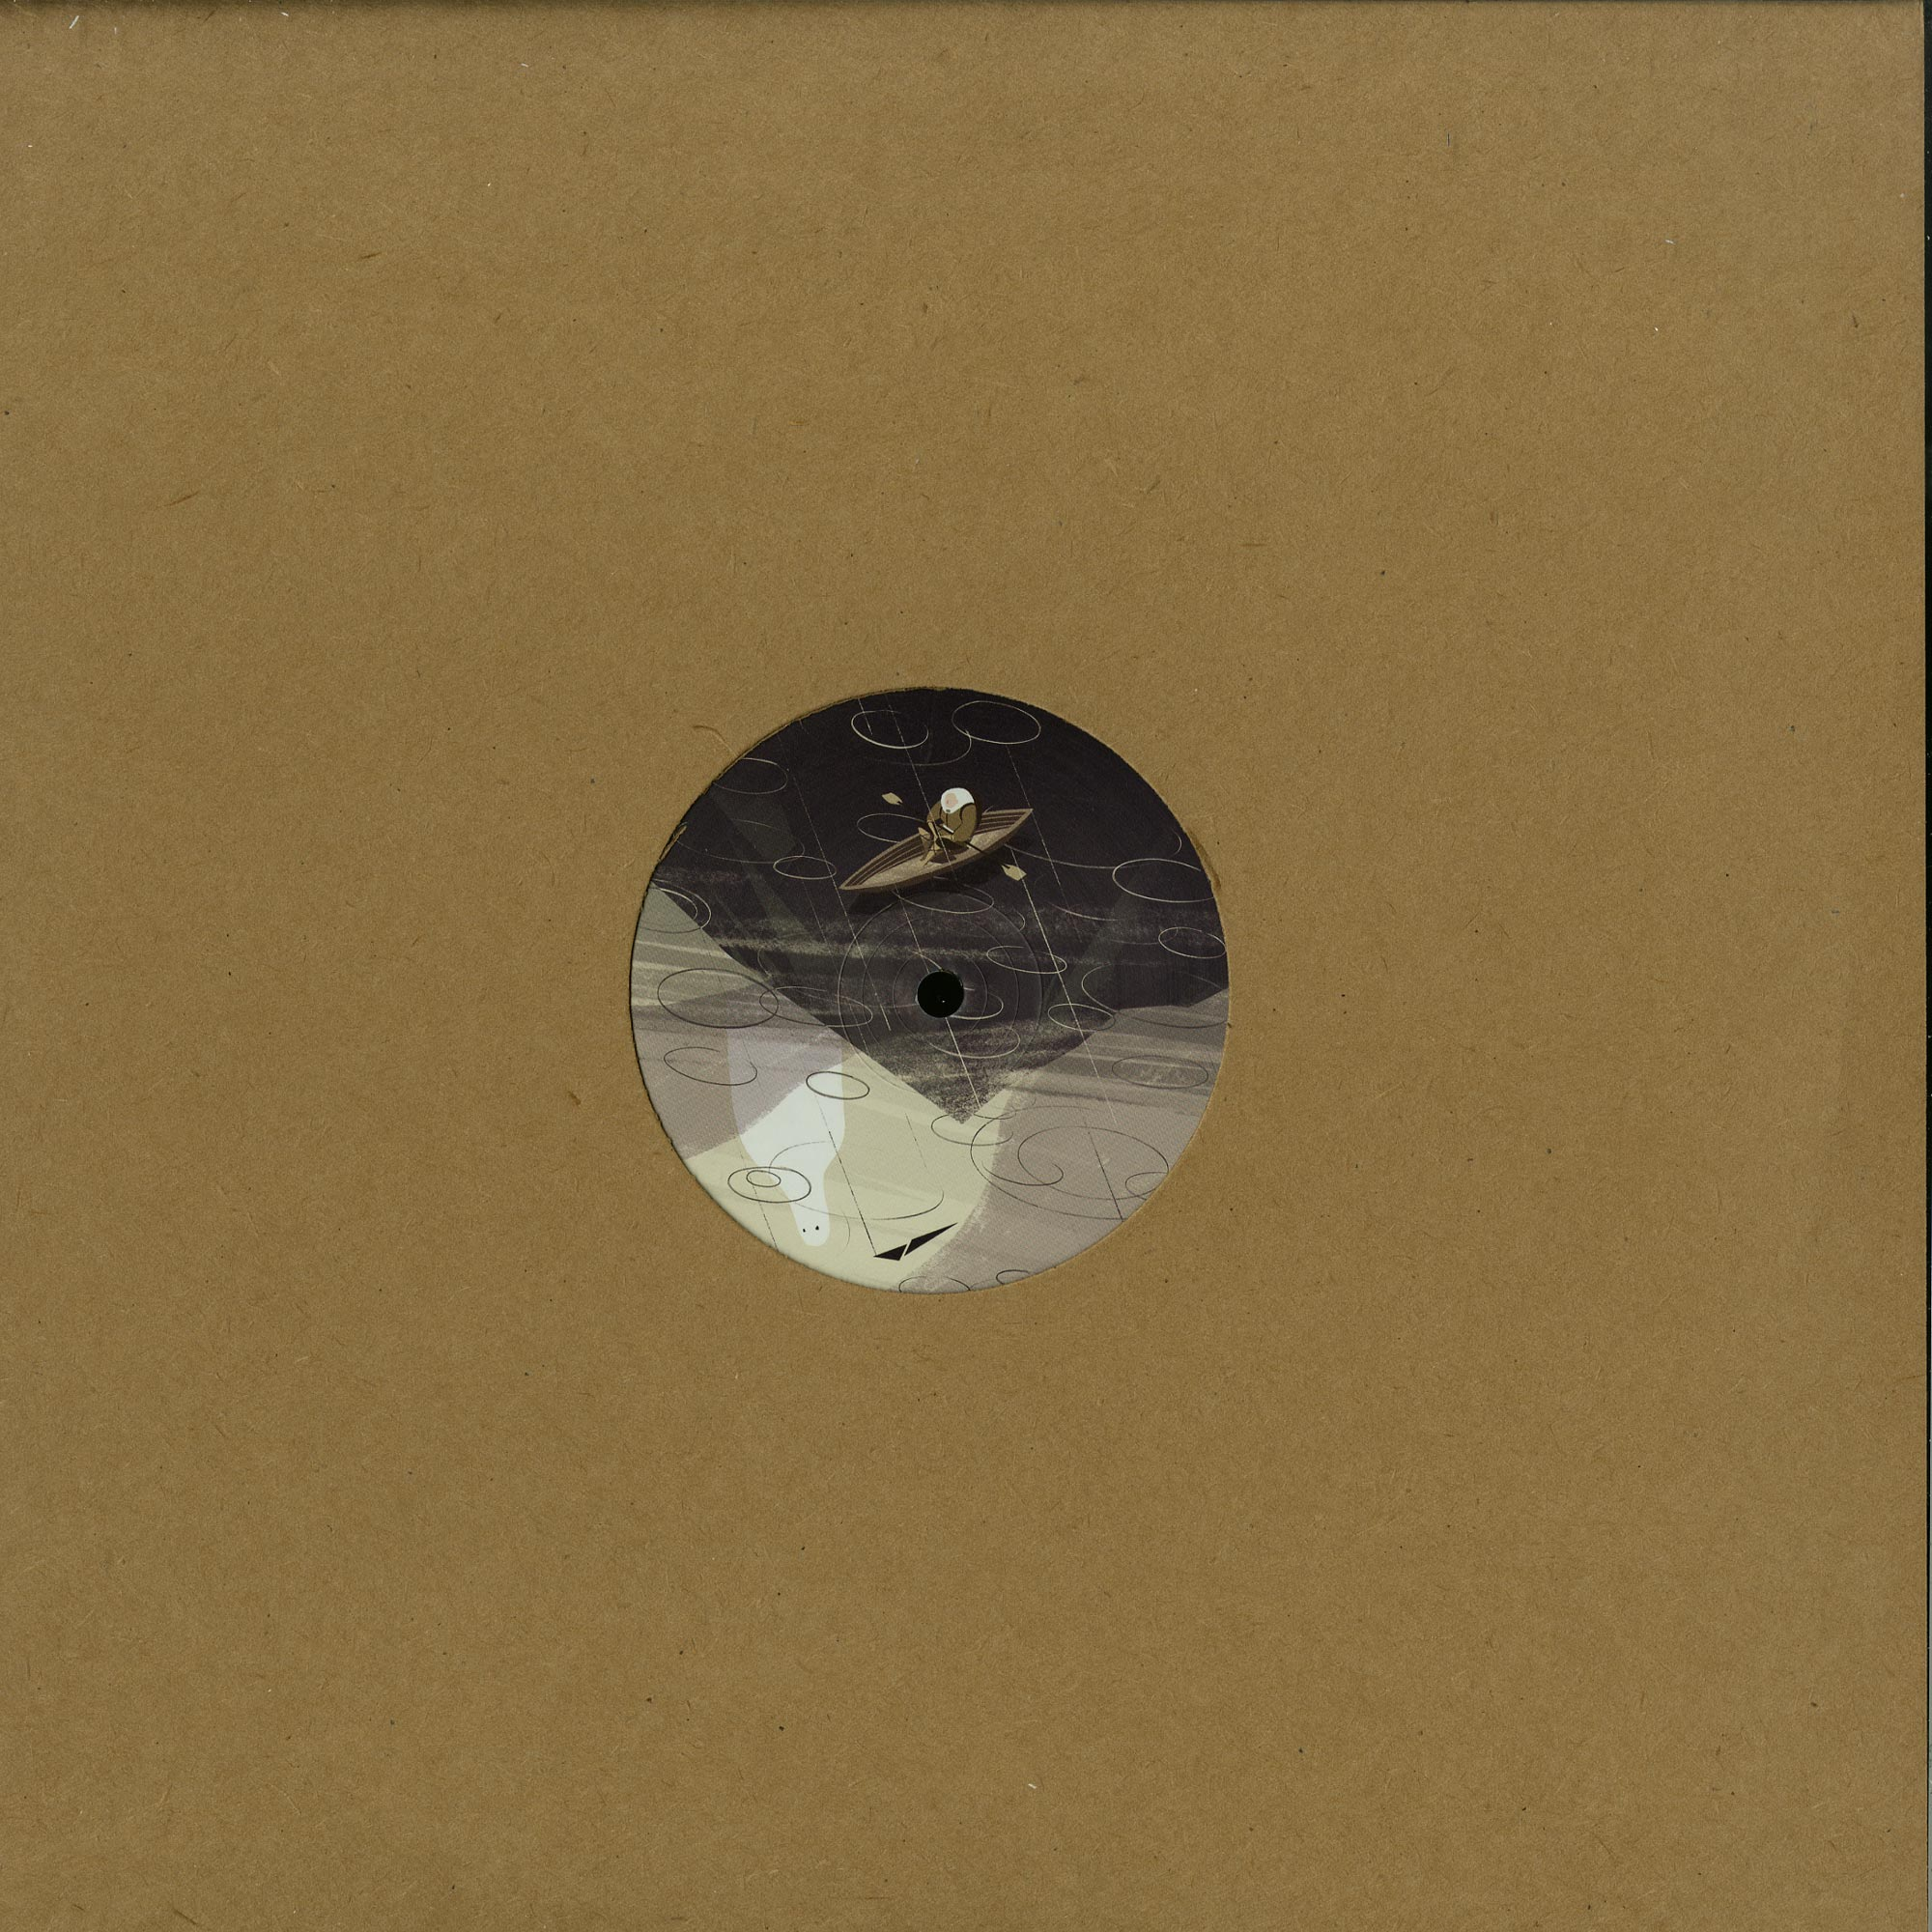 Patrick Bolton - PROGNOSIS EP